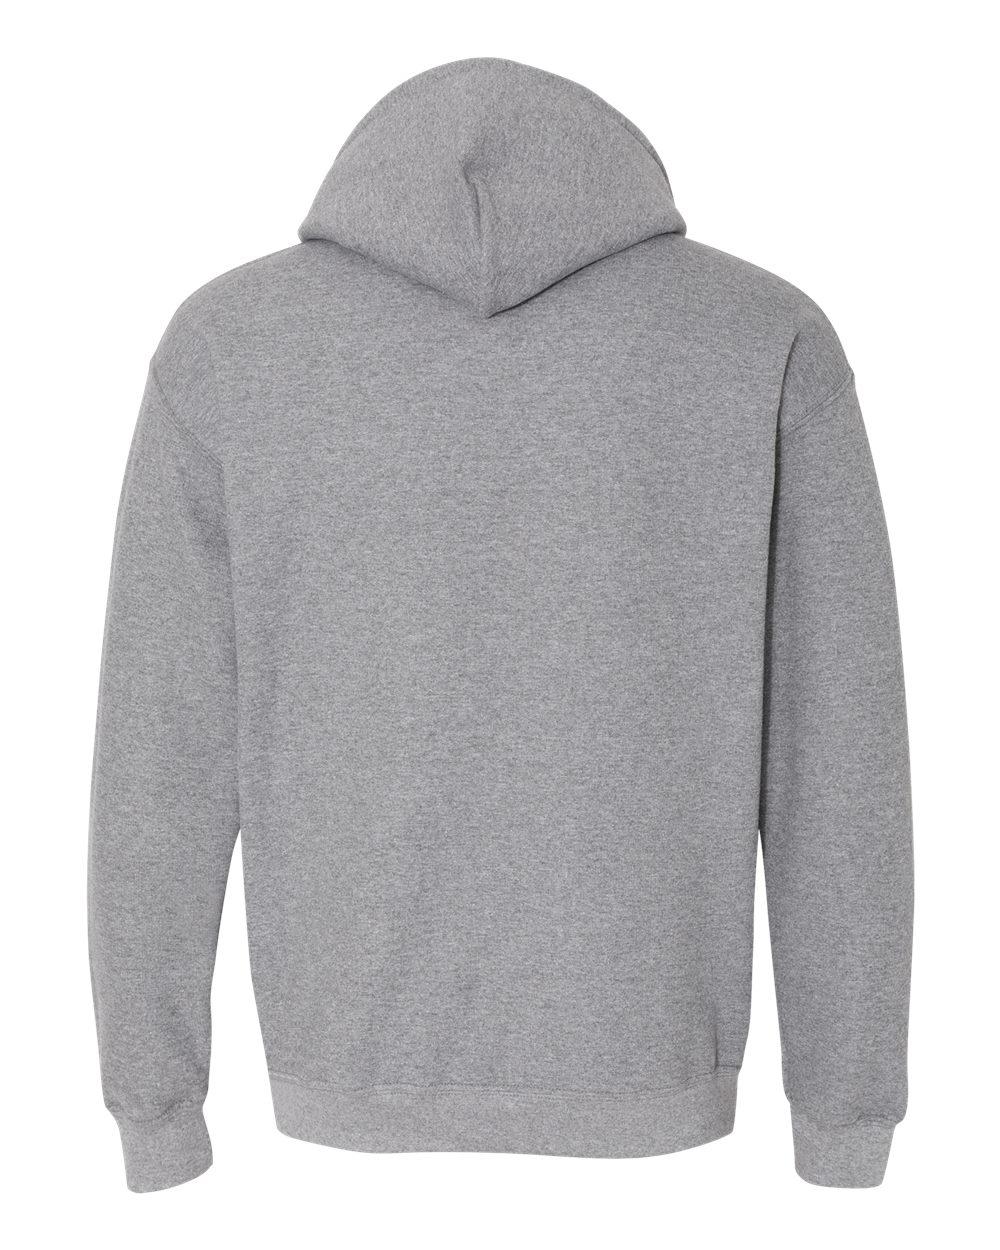 Gildan-Mens-Blank-Hoodie-Heavy-Blend-Hooded-Sweatshirt-18500-up-to-5XL thumbnail 19